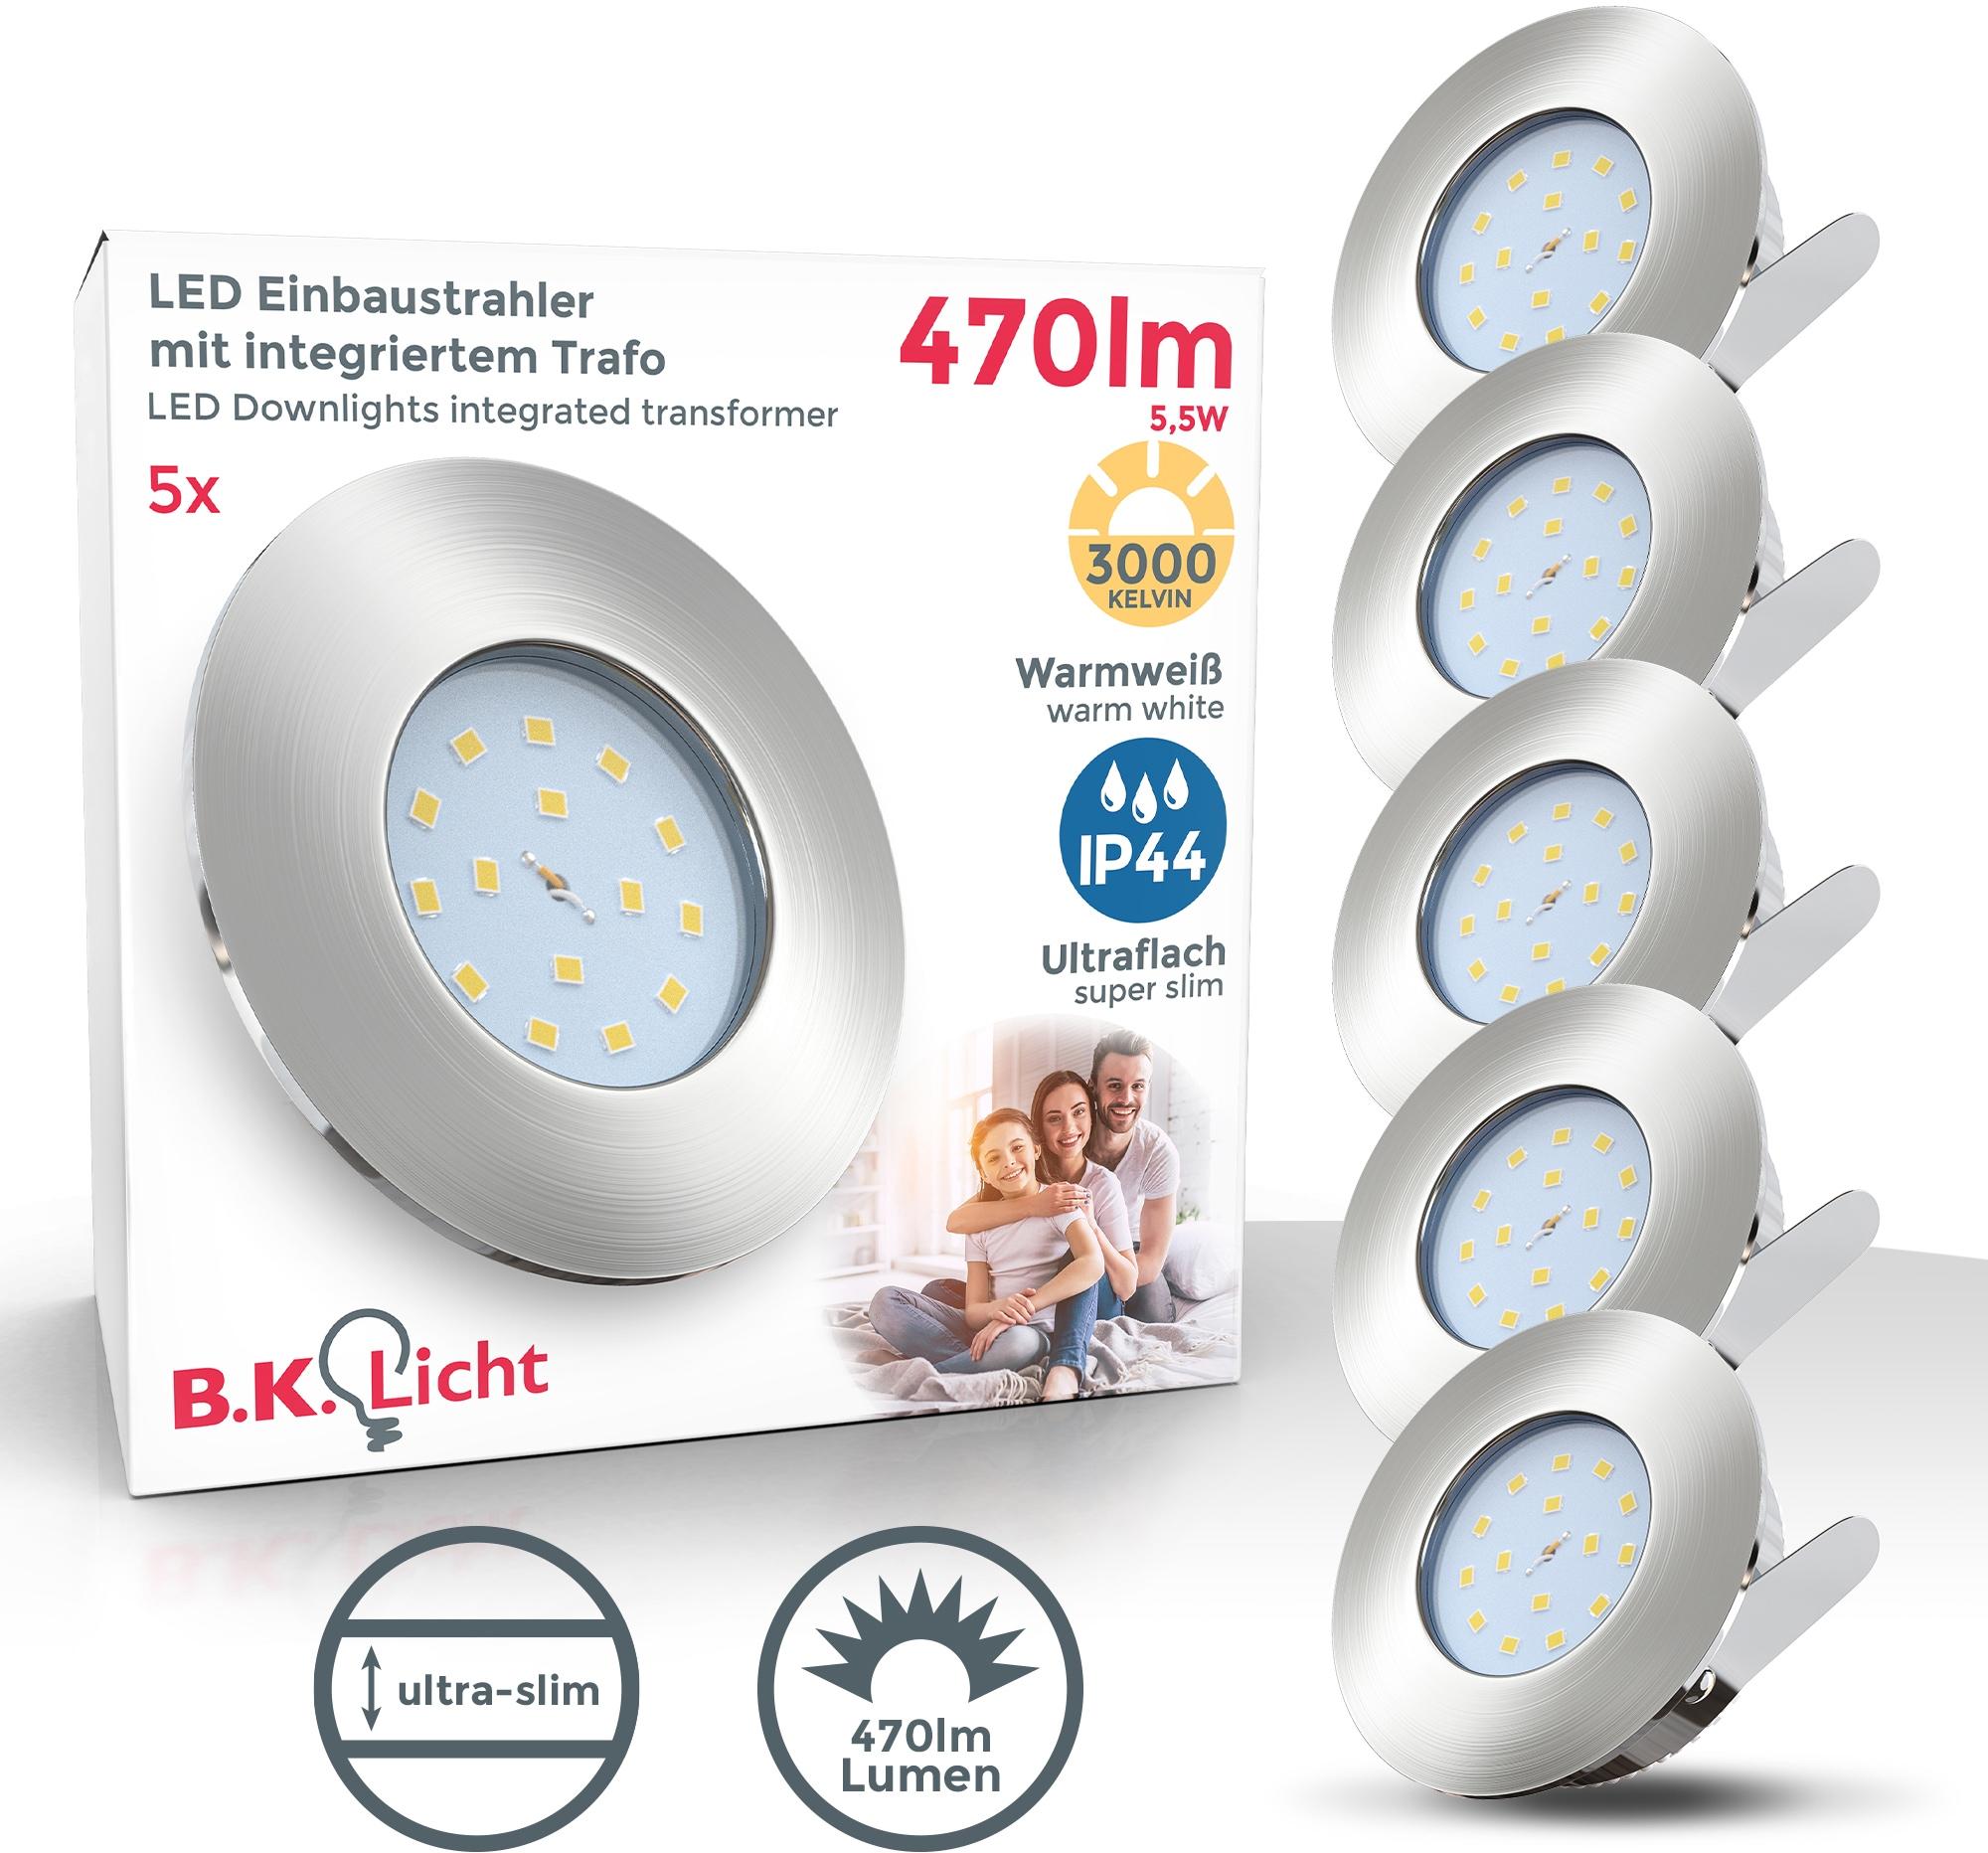 B.K.Licht LED Einbauleuchte Iris V, LED-Board, 5 St., Warmweiß, LED Einbaustrahler dimmbar ultra flach (30mm) inkl. 5W 470 Lumen LED-Modul Badspot